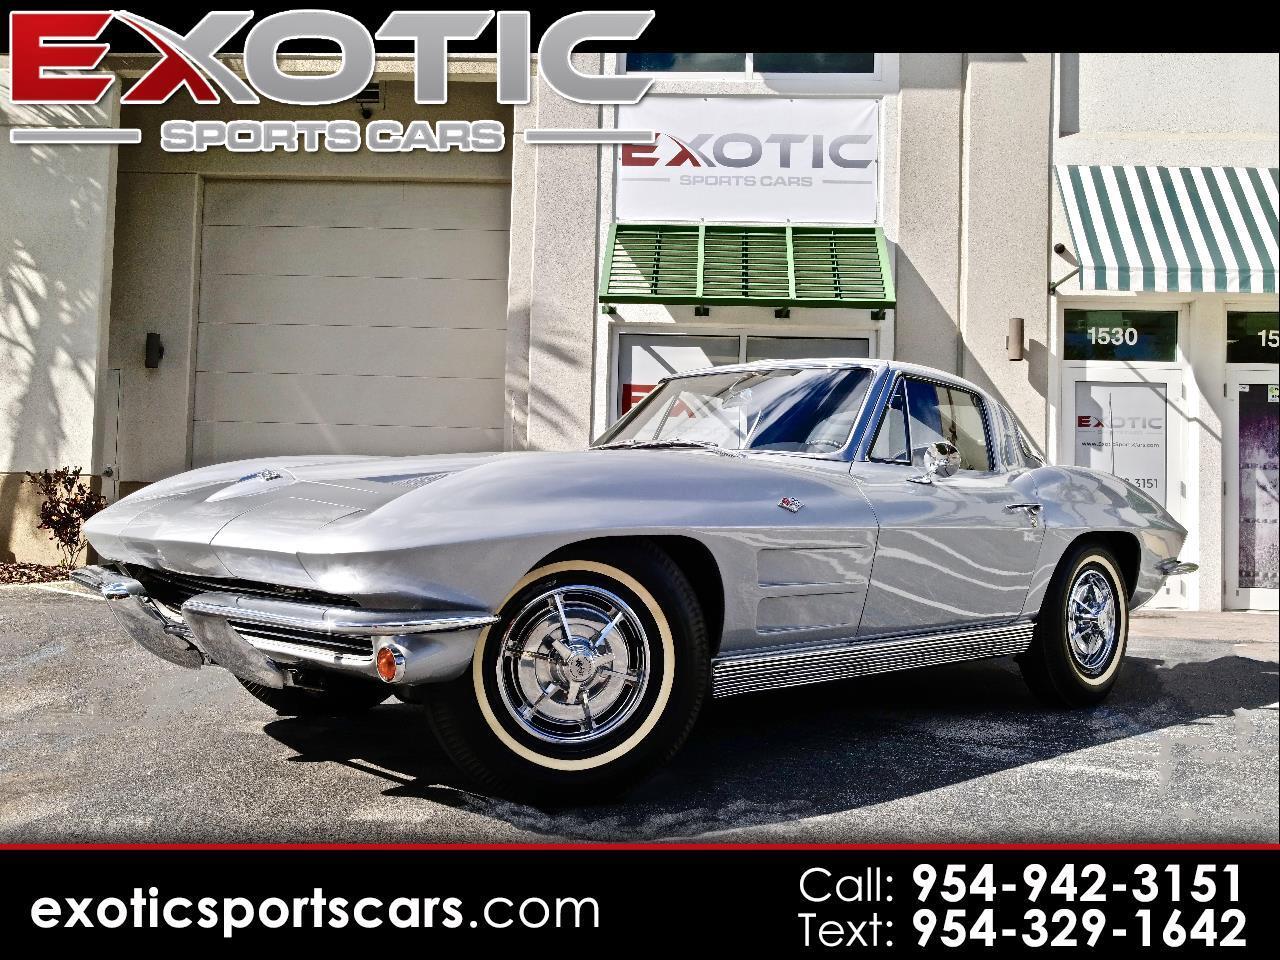 1963 Chevrolet Corvette Sting Ray  Split Window Coupe